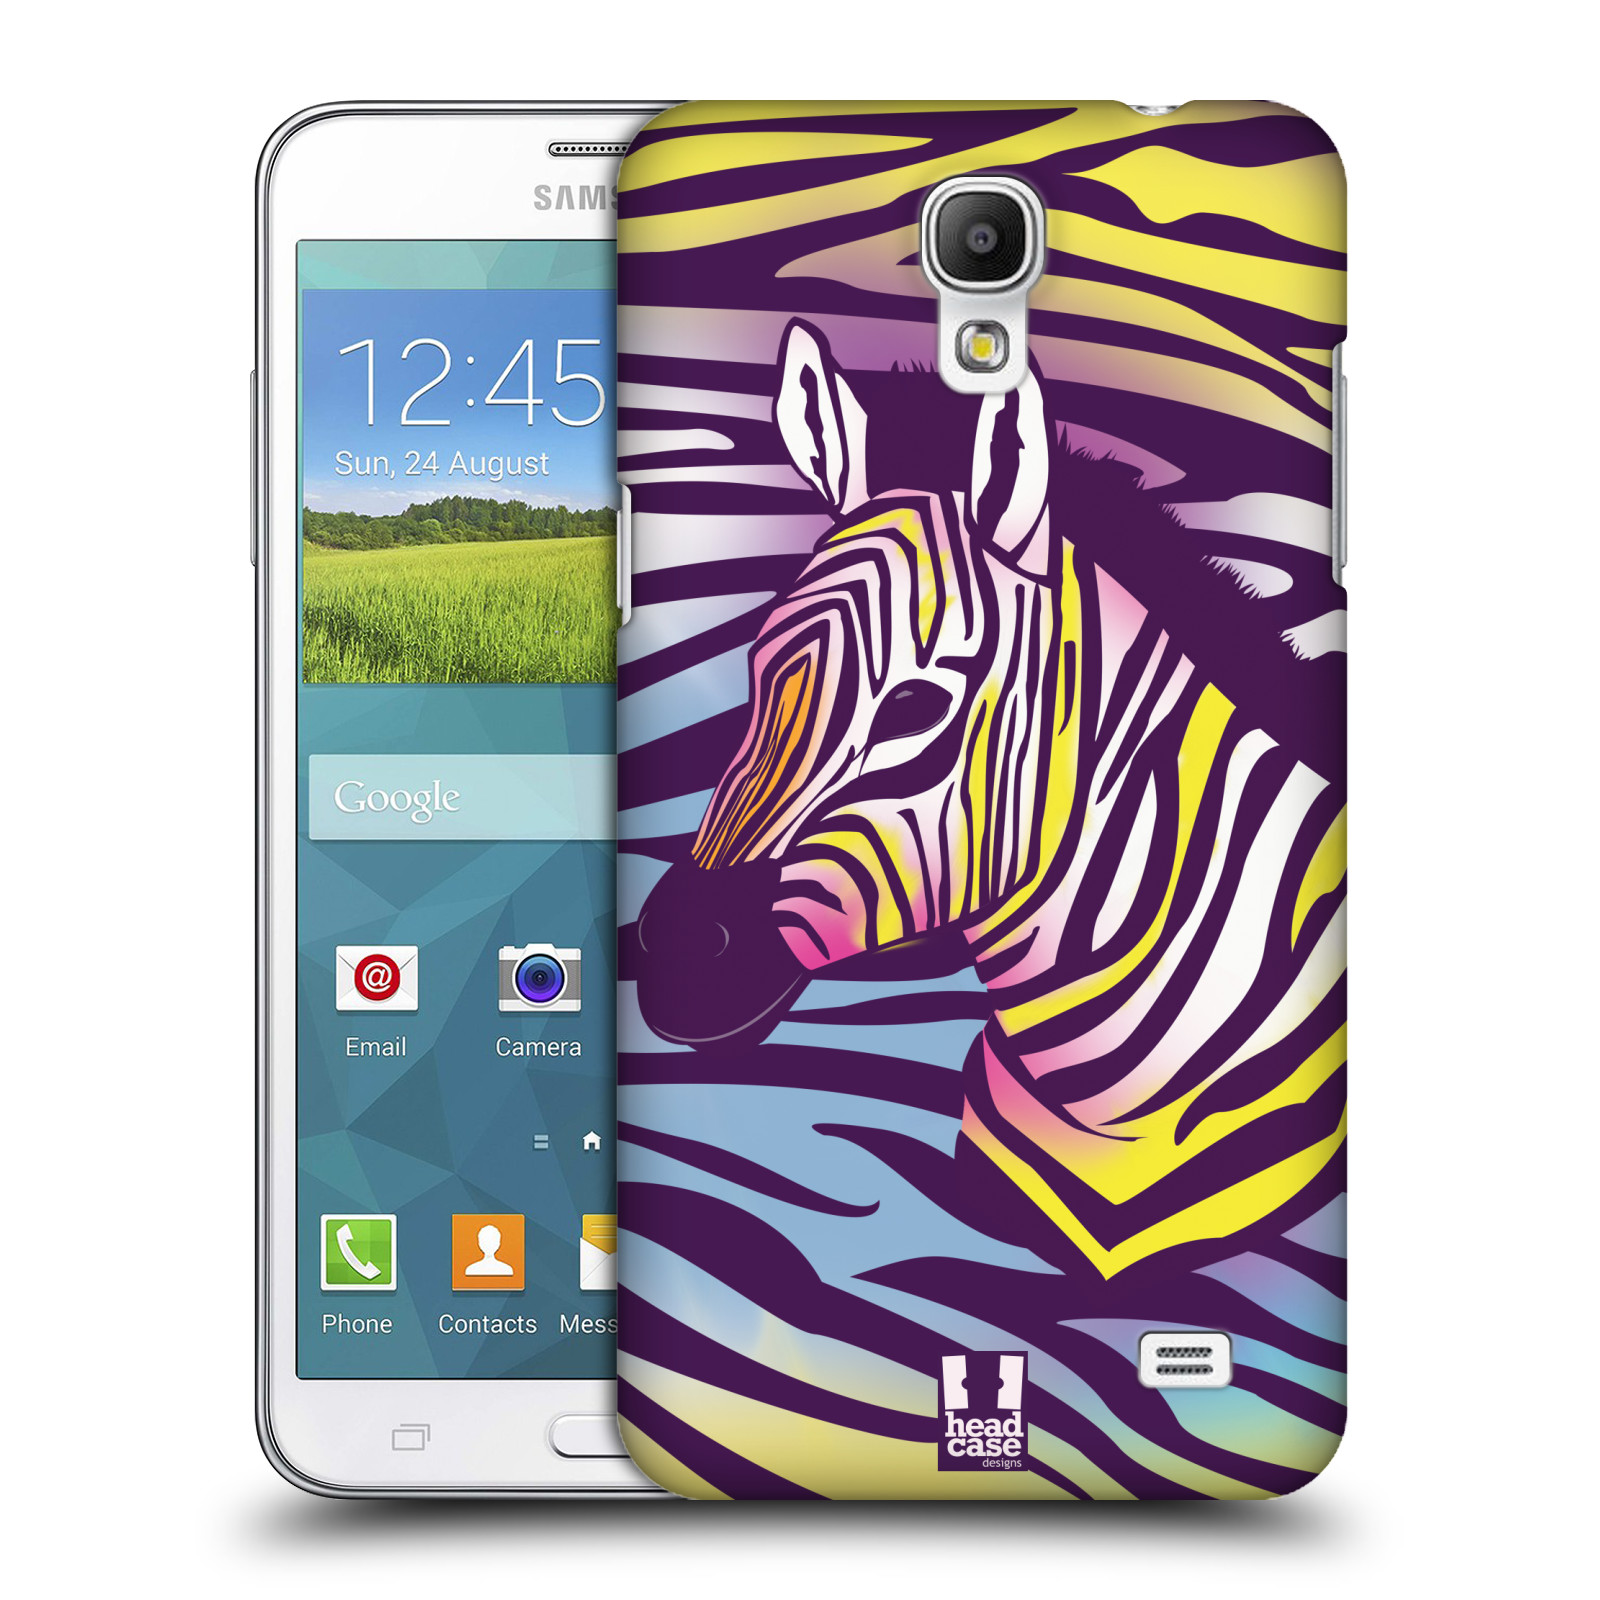 HEAD-CASE-DESIGNS-VIVID-ANIMALS-HARD-BACK-CASE-FOR-SAMSUNG-PHONES-4